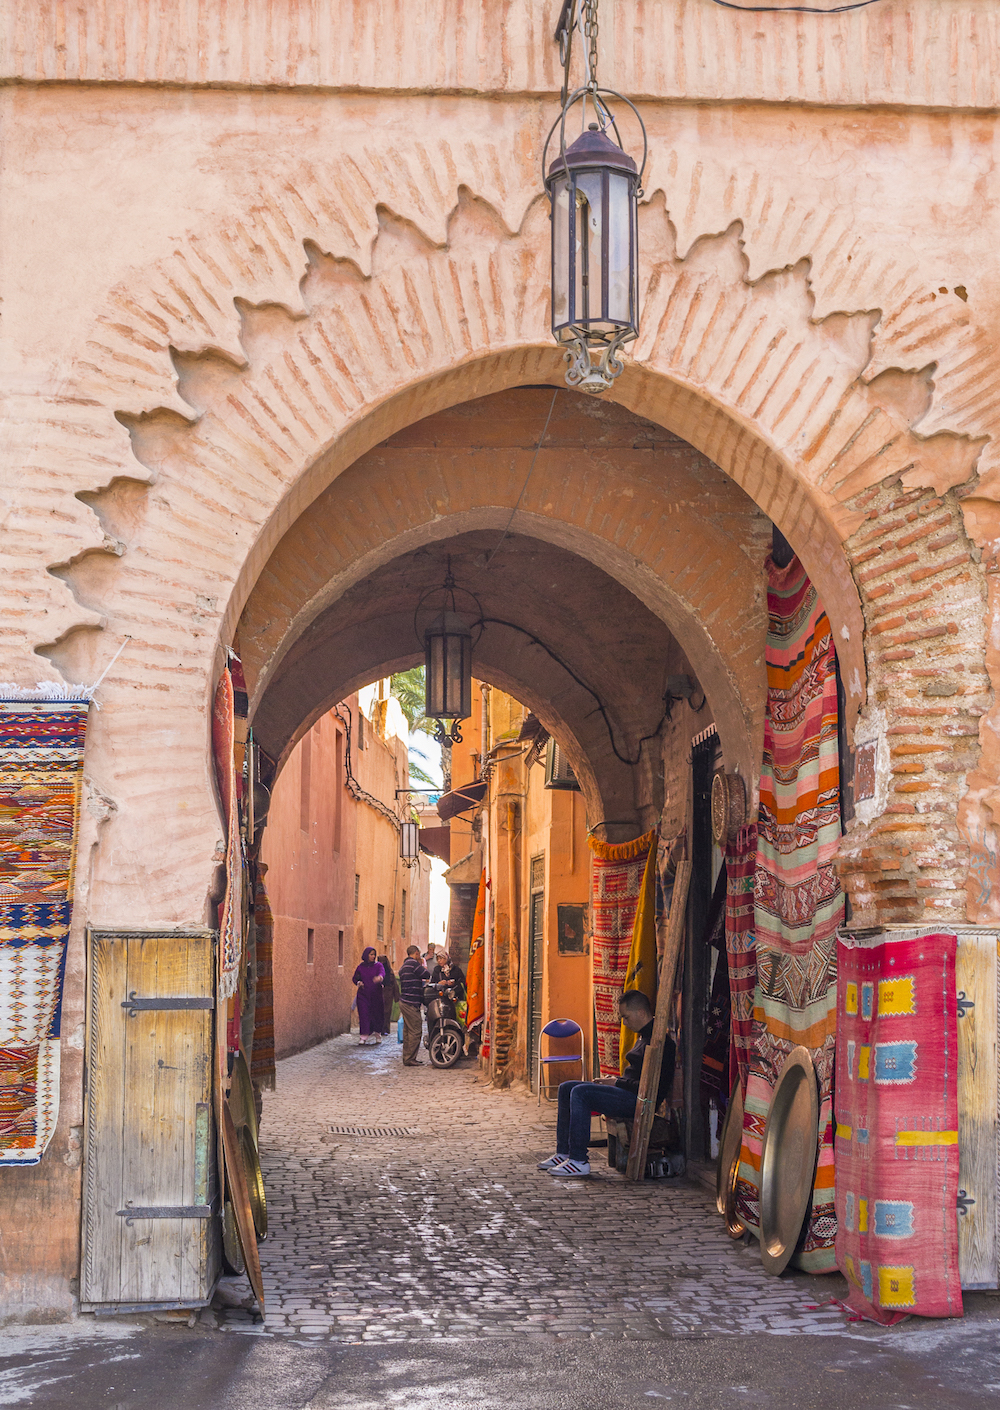 Street view inside the Medina in Marrakech.jpg